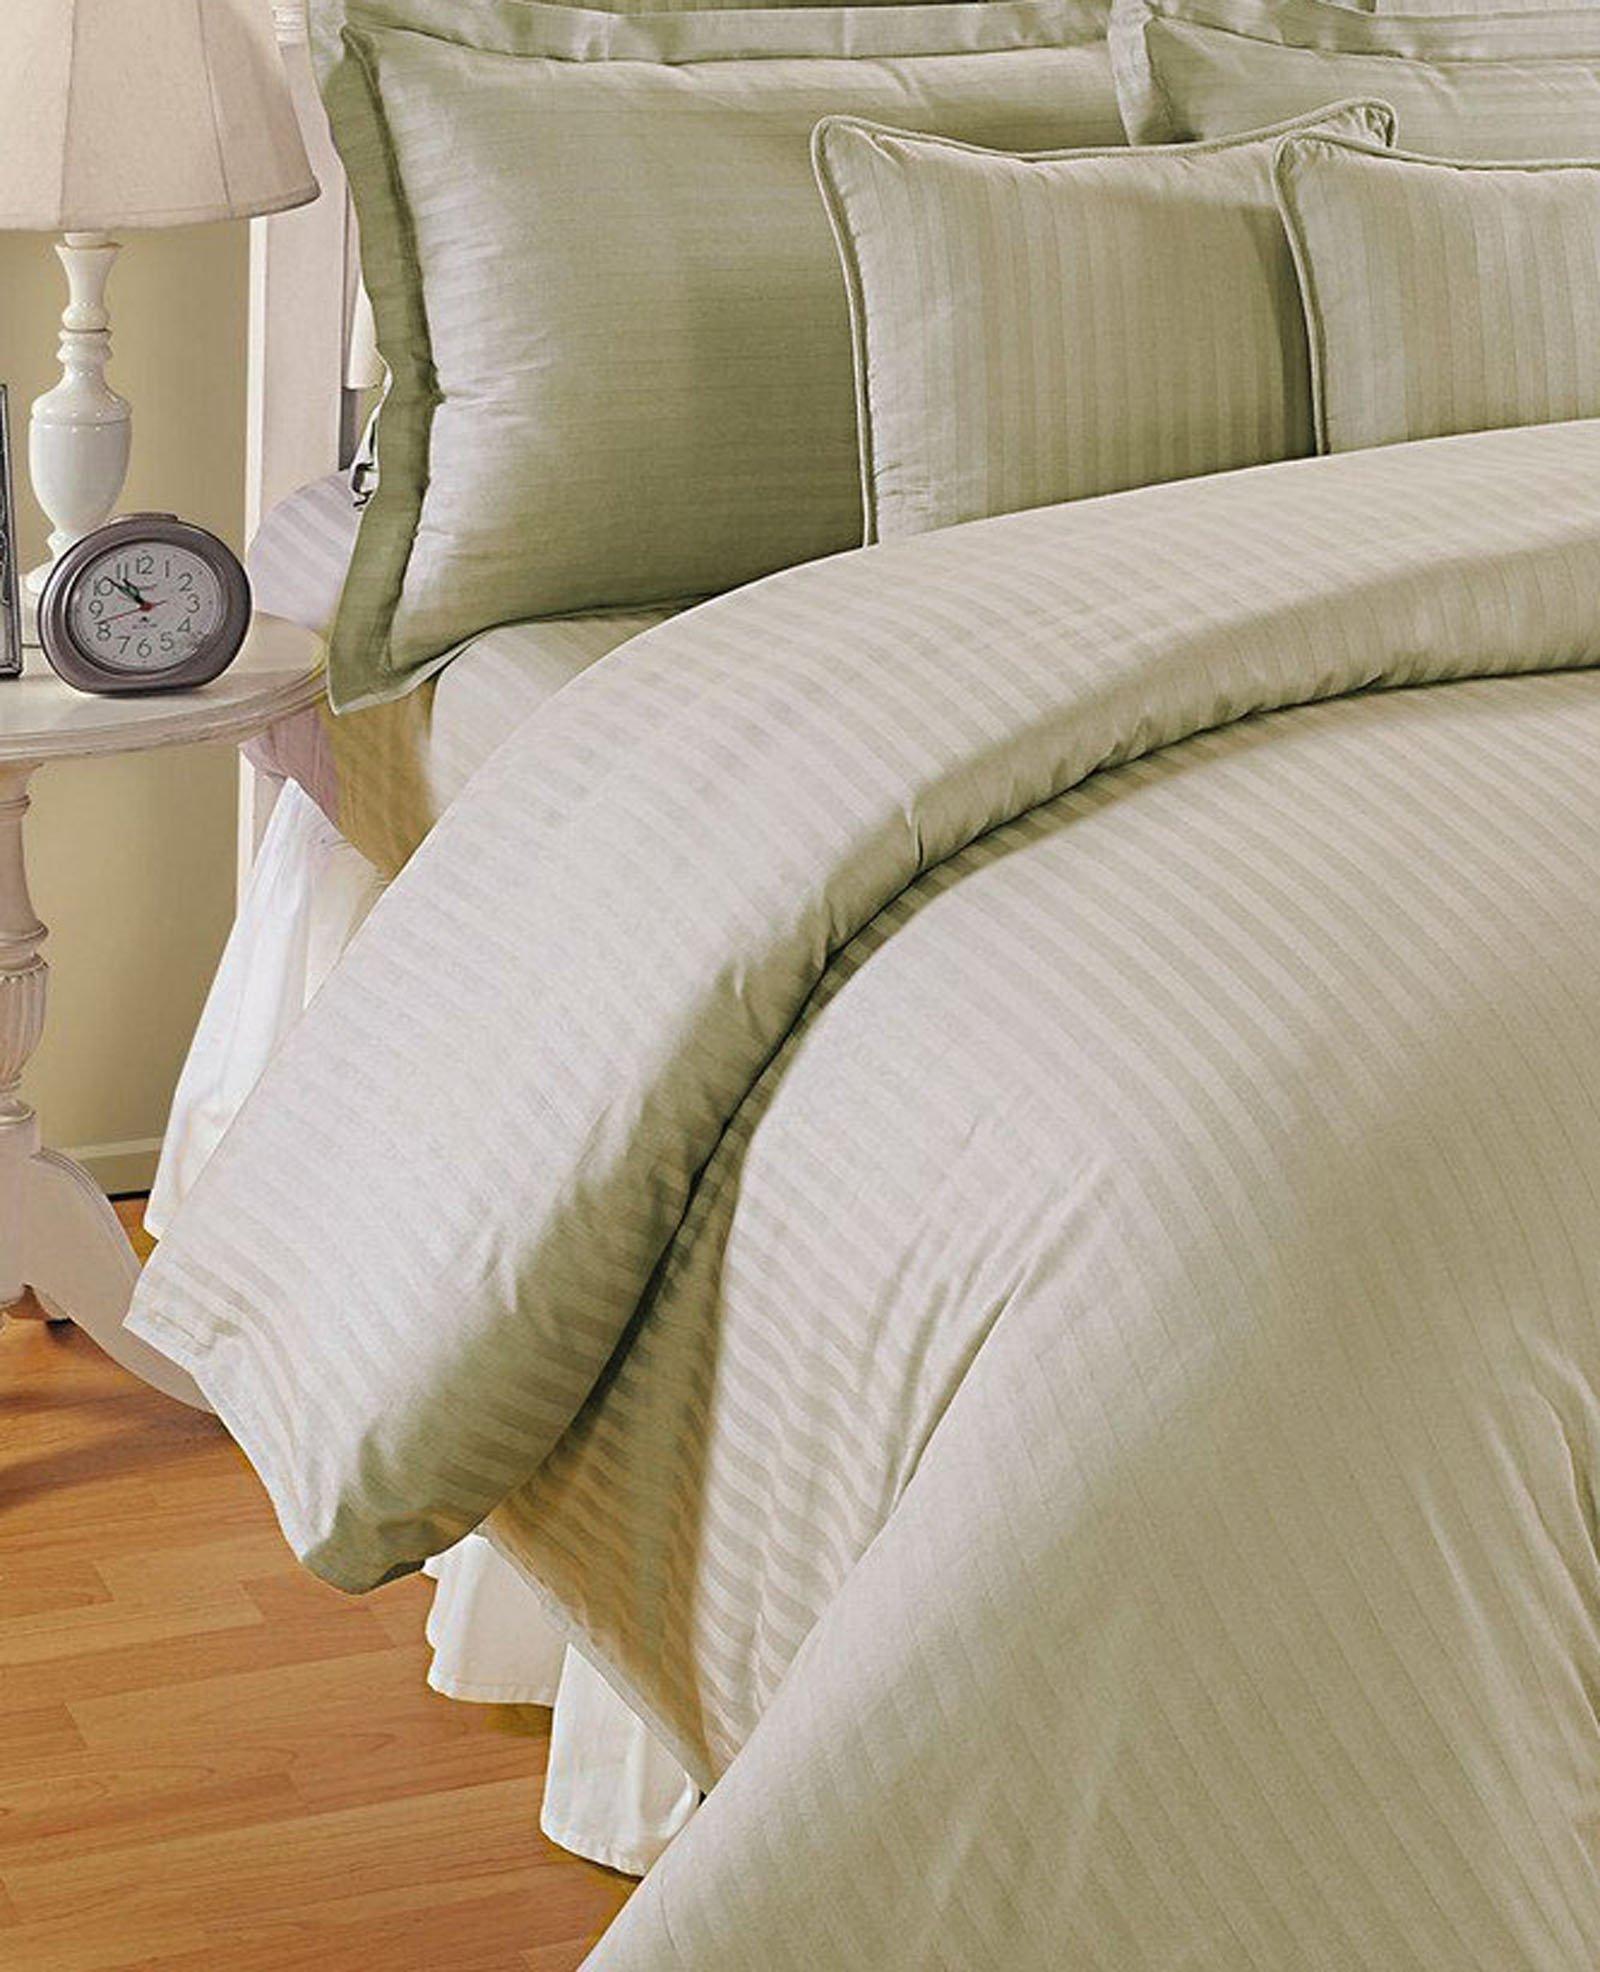 Yuga 8 Pieces Bed In Bag Set Printed Mauve Cotton Material Comforter Bedding Set